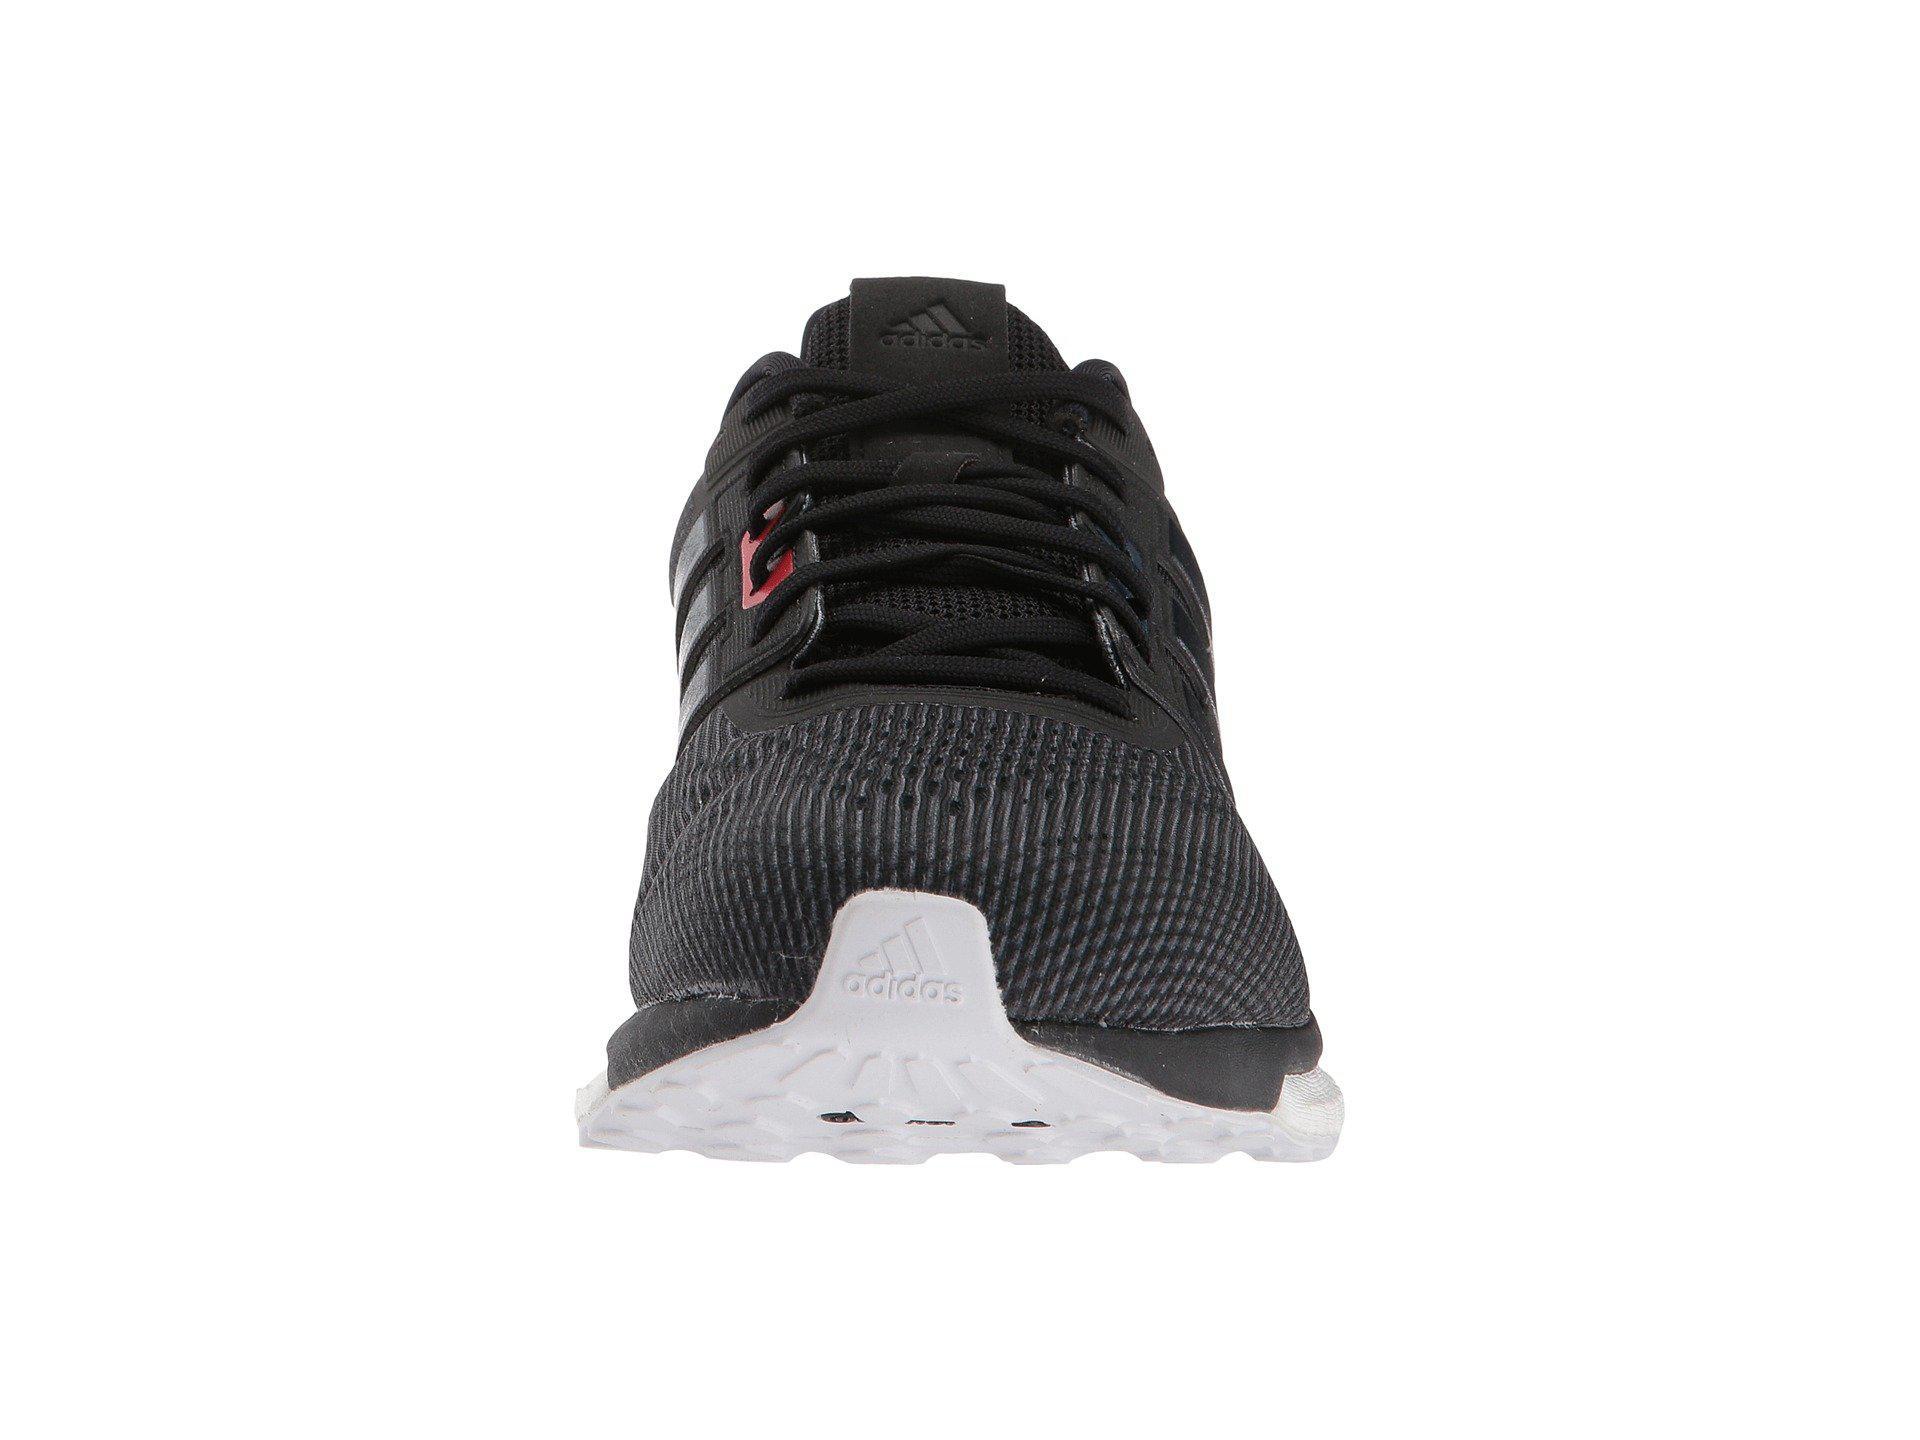 reputable site 62107 90018 Lyst - Adidas Originals Supernova (solar Slime footwear White hi-res ...